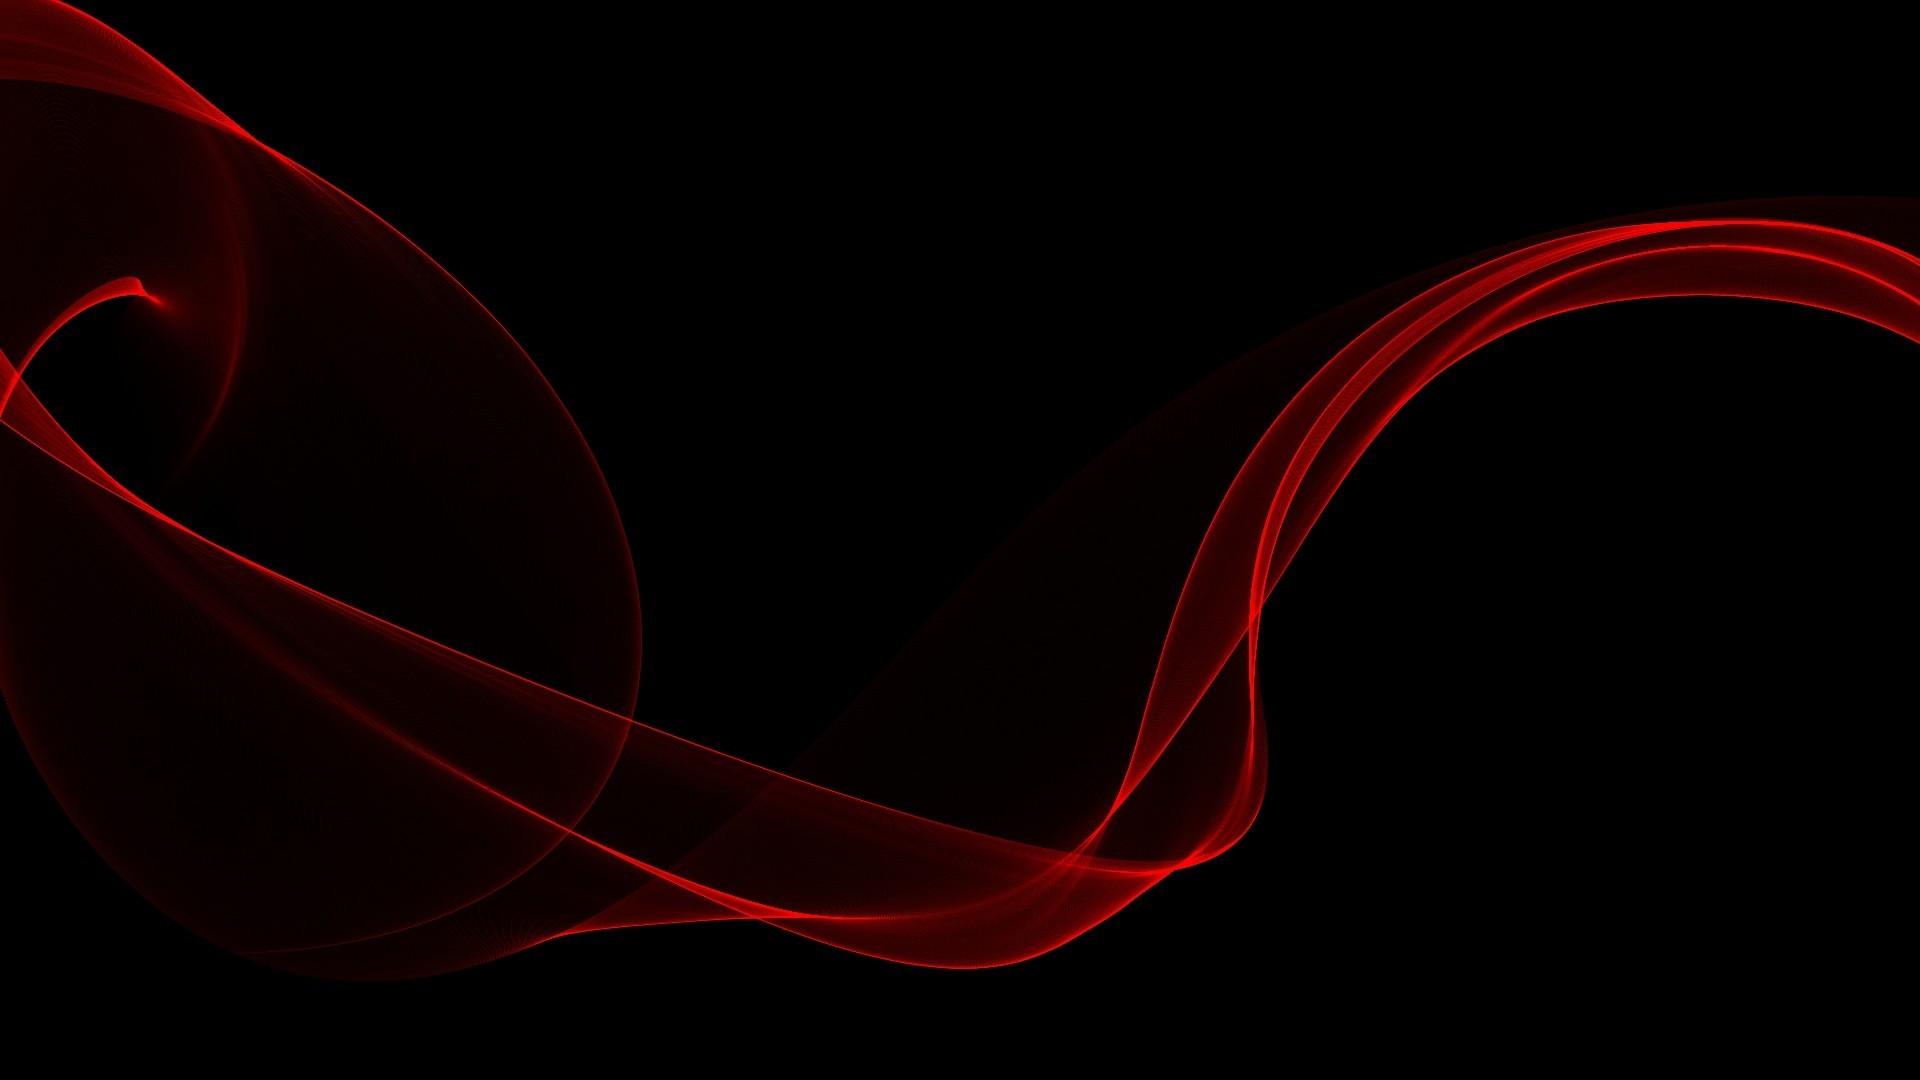 Abstract Black Wallpaper Abstract, Black, Minimalistic .